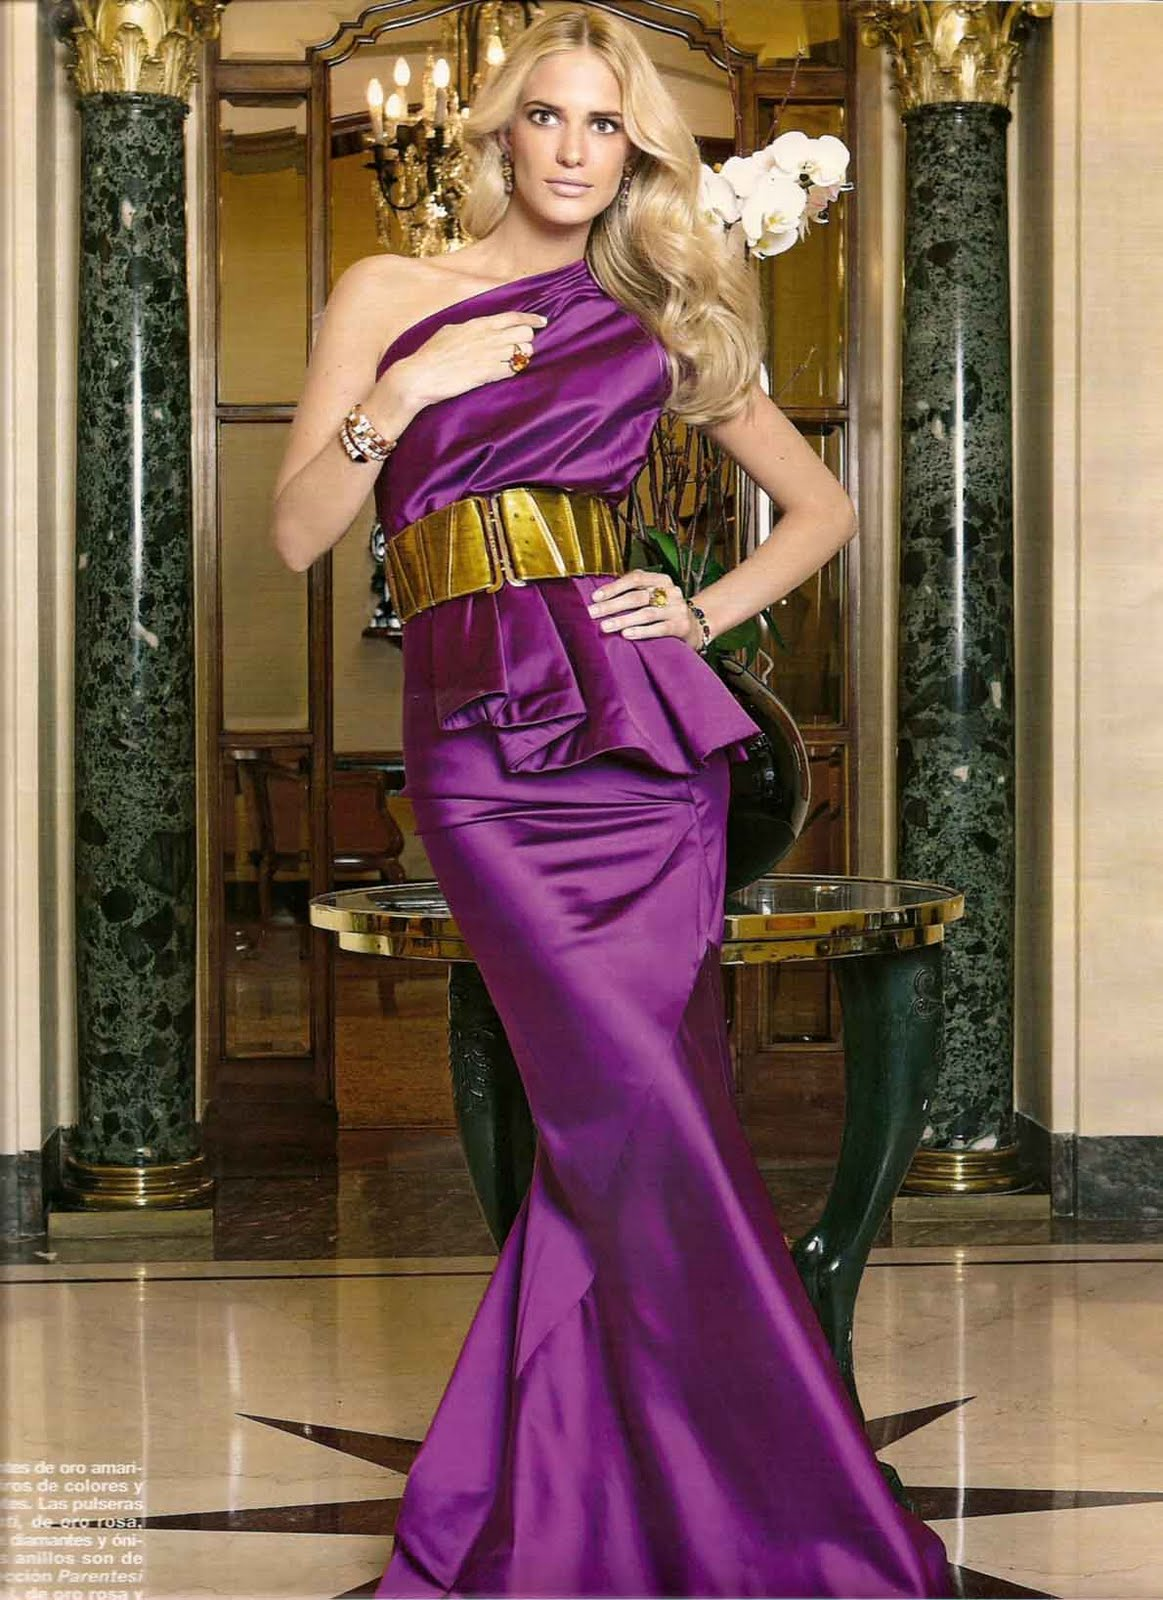 8002672b4ca5a طلبــات الفساتيــن Fashion Requests  الارشيف  - منتديات شبكة الإقلاع ®